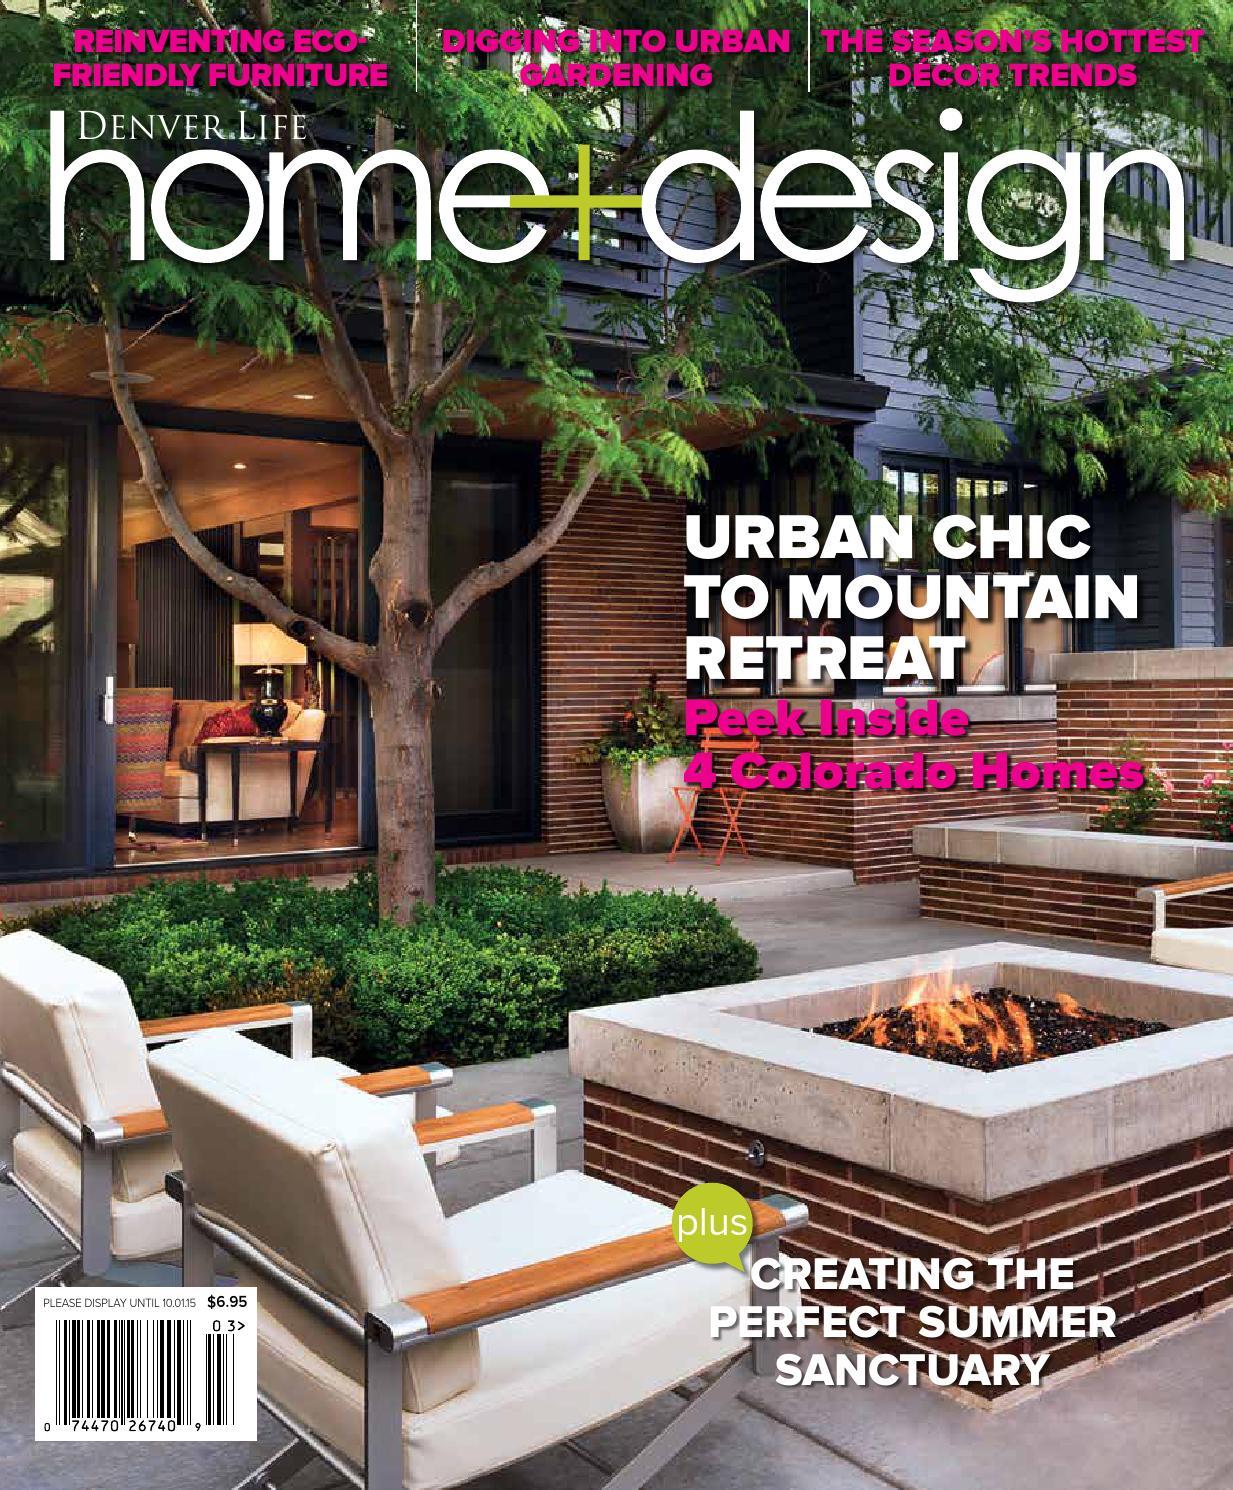 Denver Life Home+design Summer 2015 By Denver Life Home+design